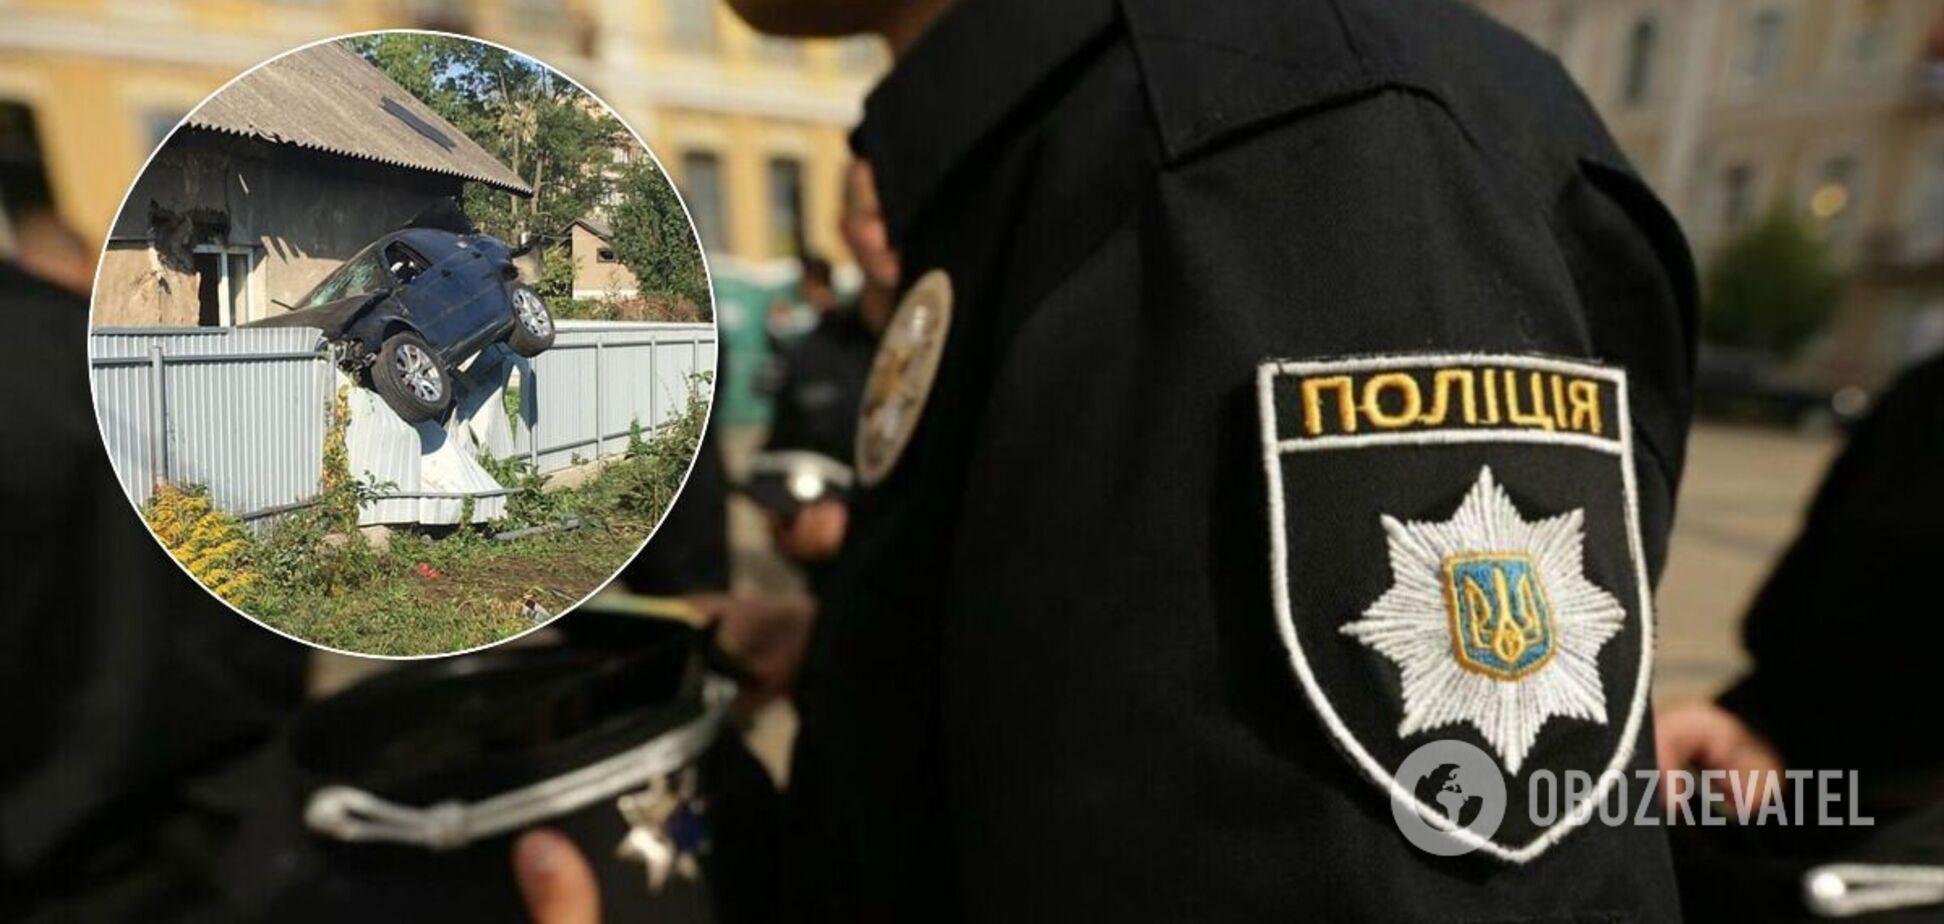 ДТП у Чернівцях із поліцейським